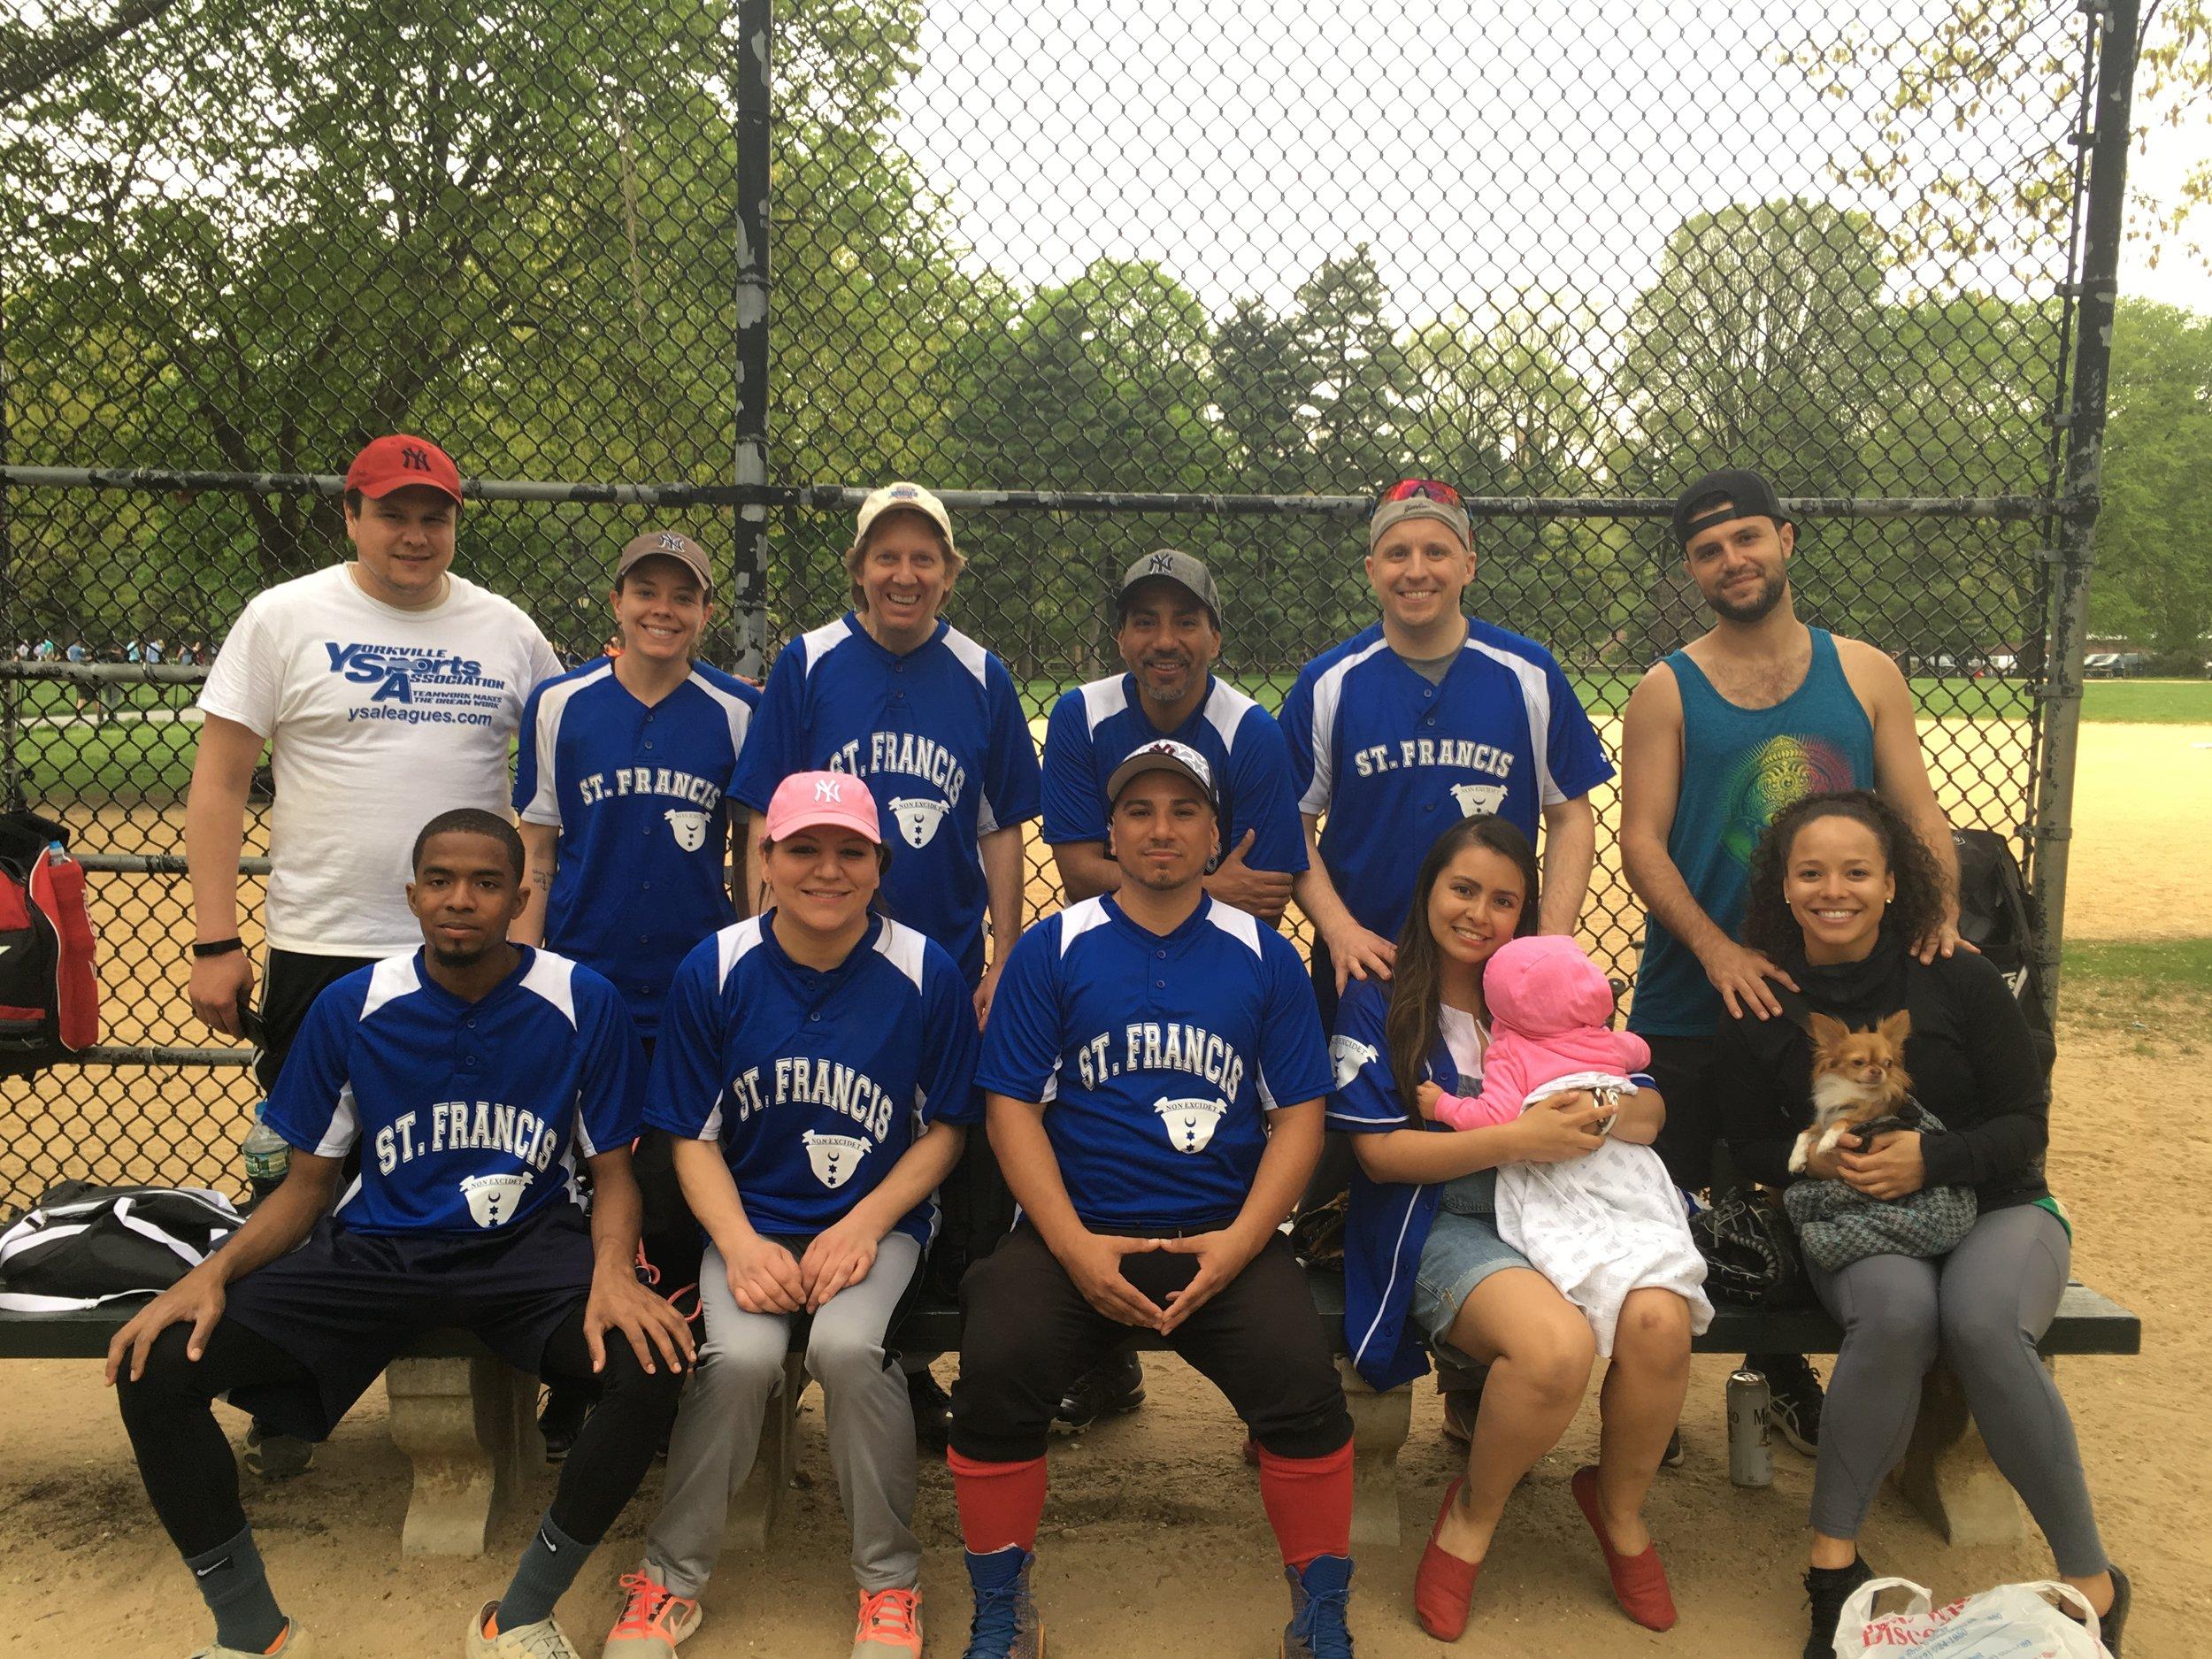 12 Catholic Sports St Francis de Sales NYC.JPG